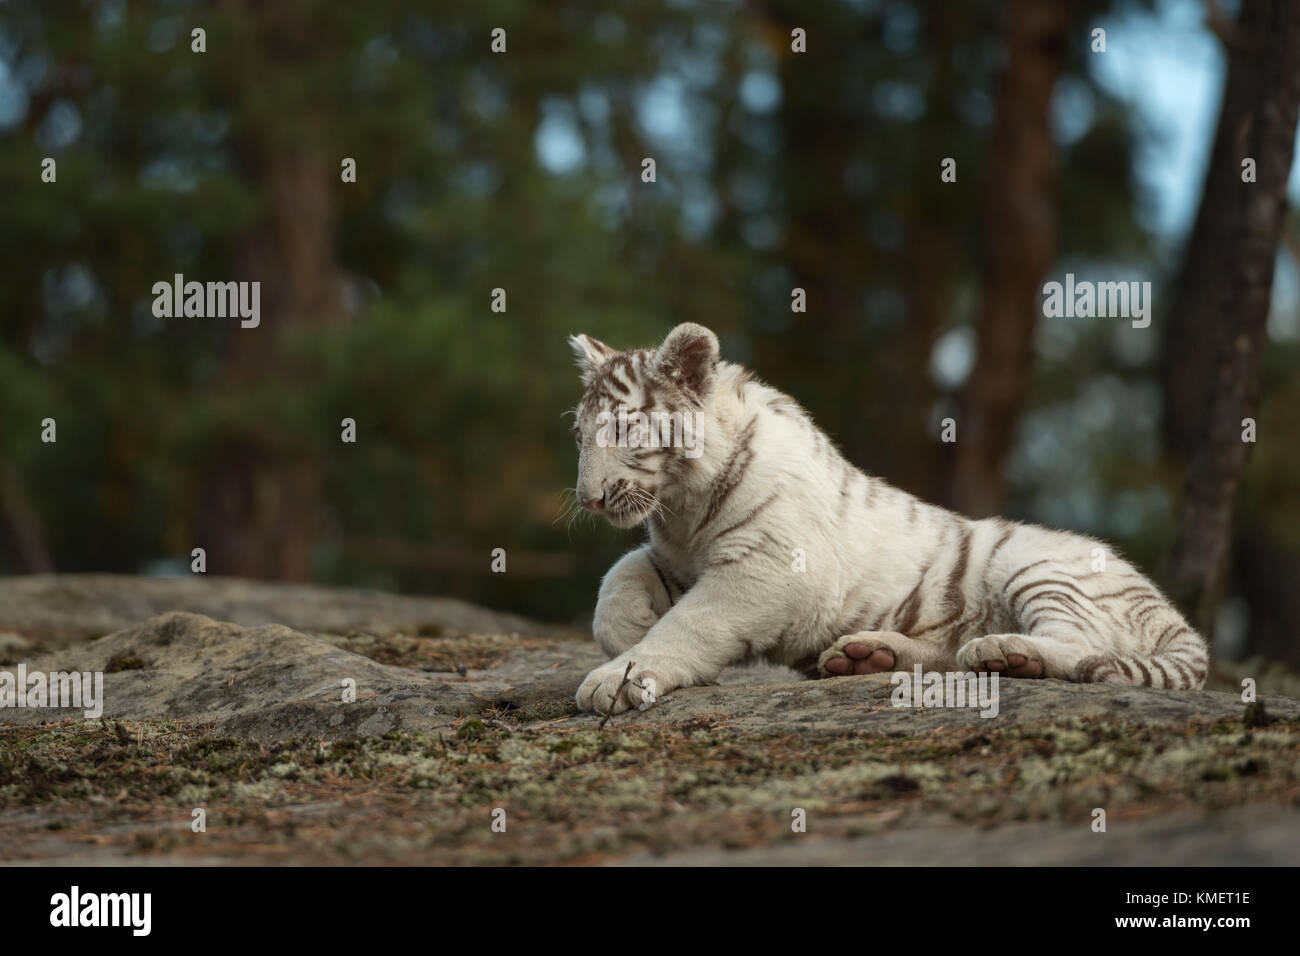 Royal Bengal Tiger / Koenigstiger ( Panthera tigris ), white animal, resting on rocks at the edge of a forest, nice - Stock Image